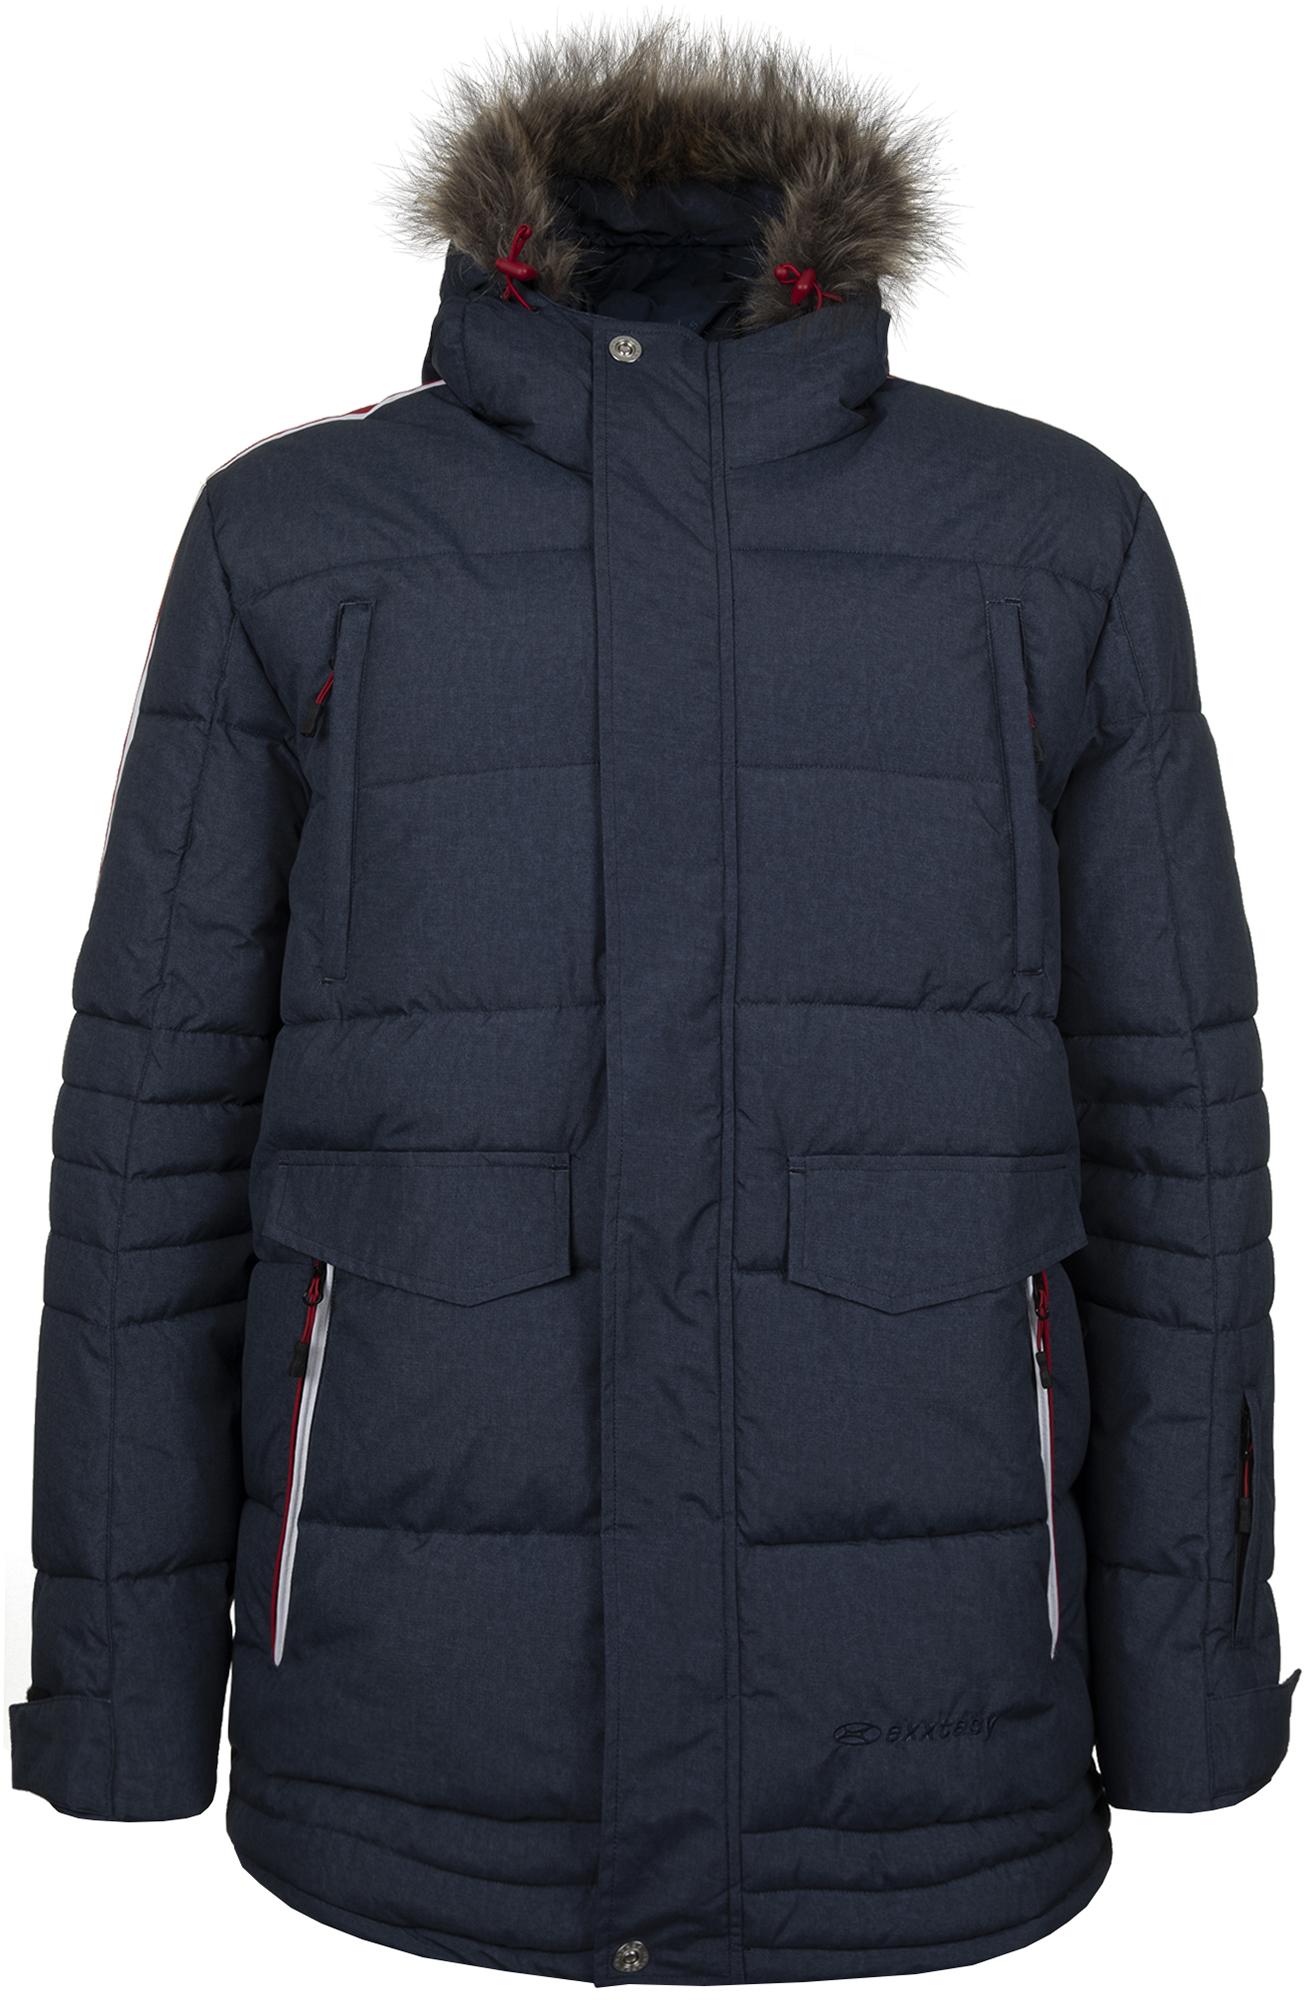 Exxtasy Куртка утепленная мужская Vanzone, размер 44-46